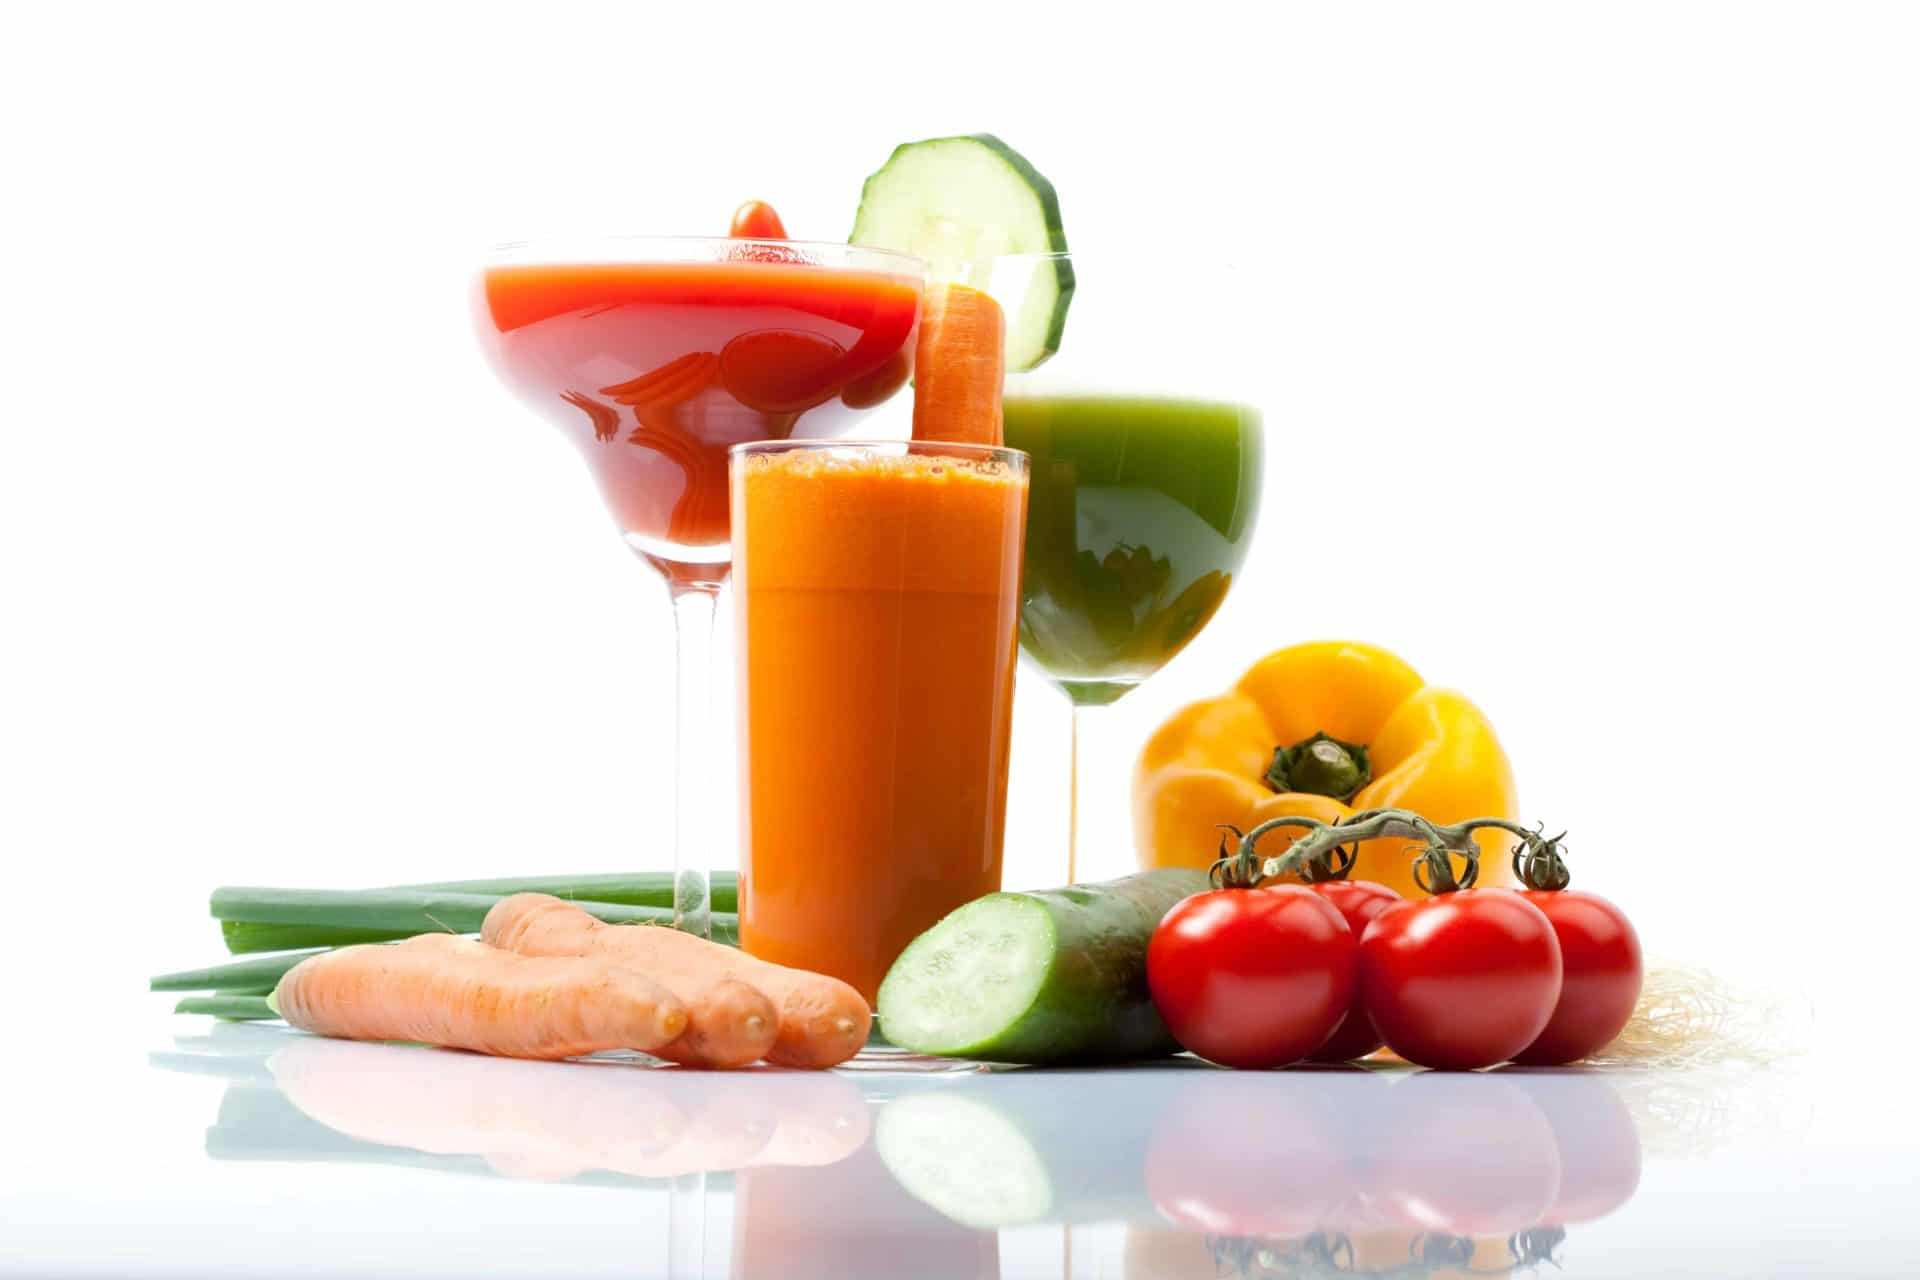 Veggie Juice Shake Smoothie